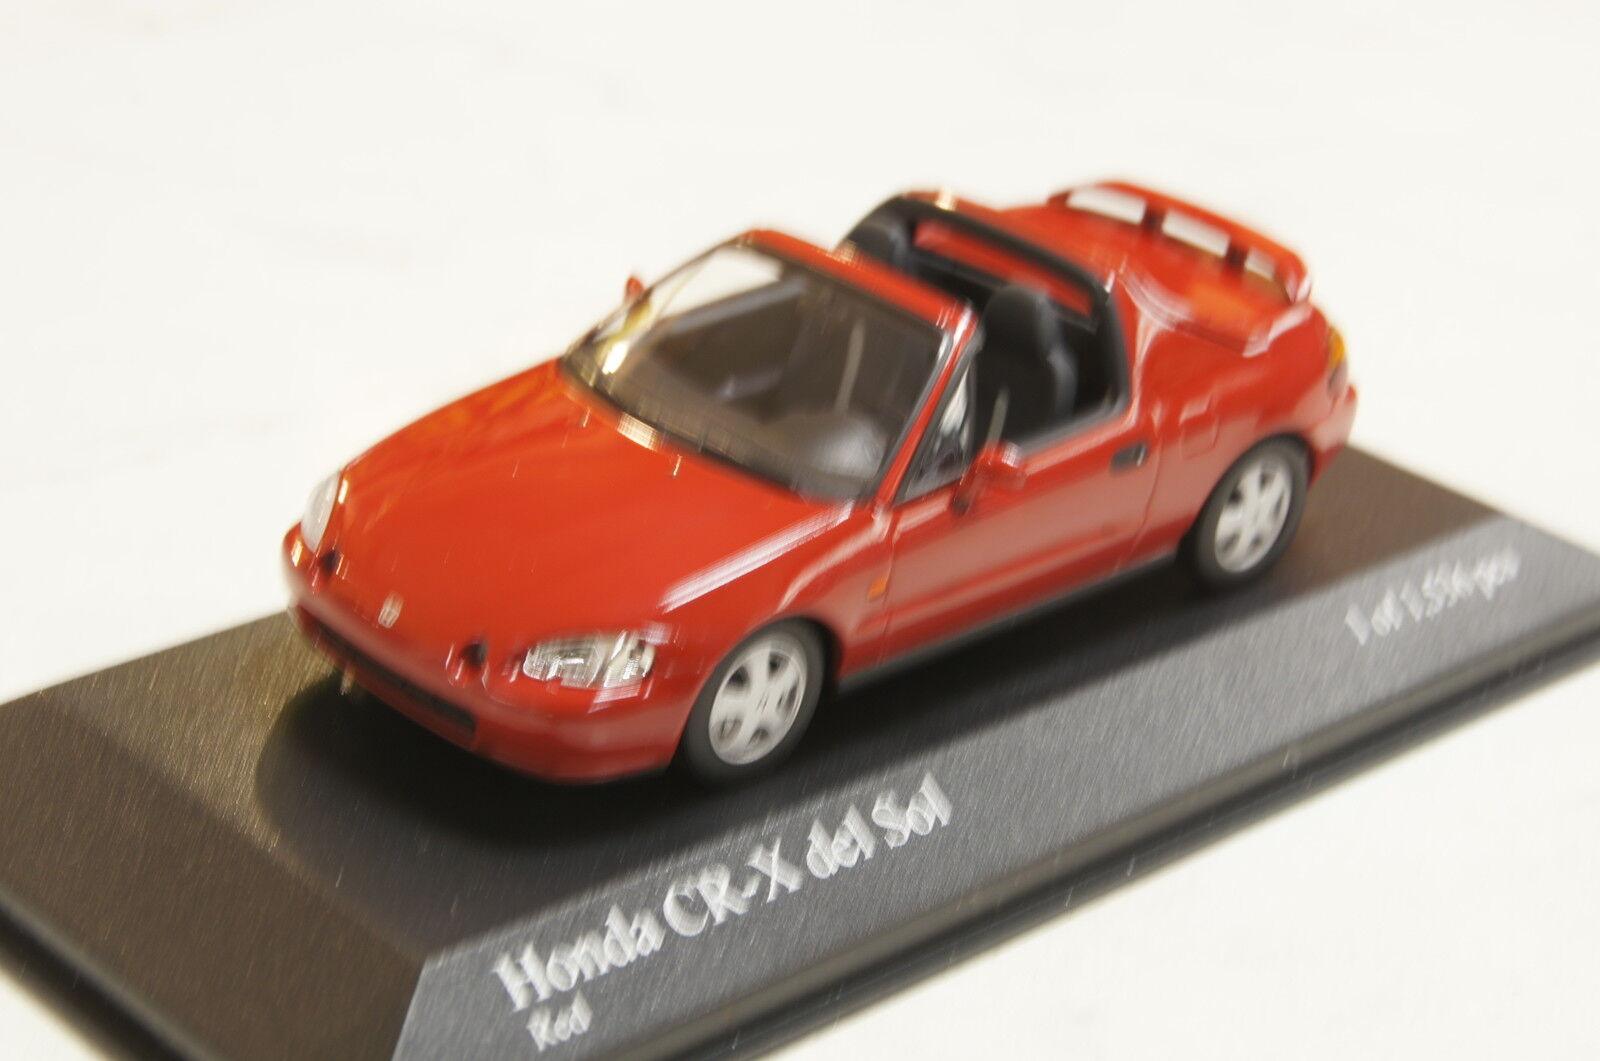 Honda Civic CR-X del sol rojo 1993 1 43 Minichamps nuevo & OVP